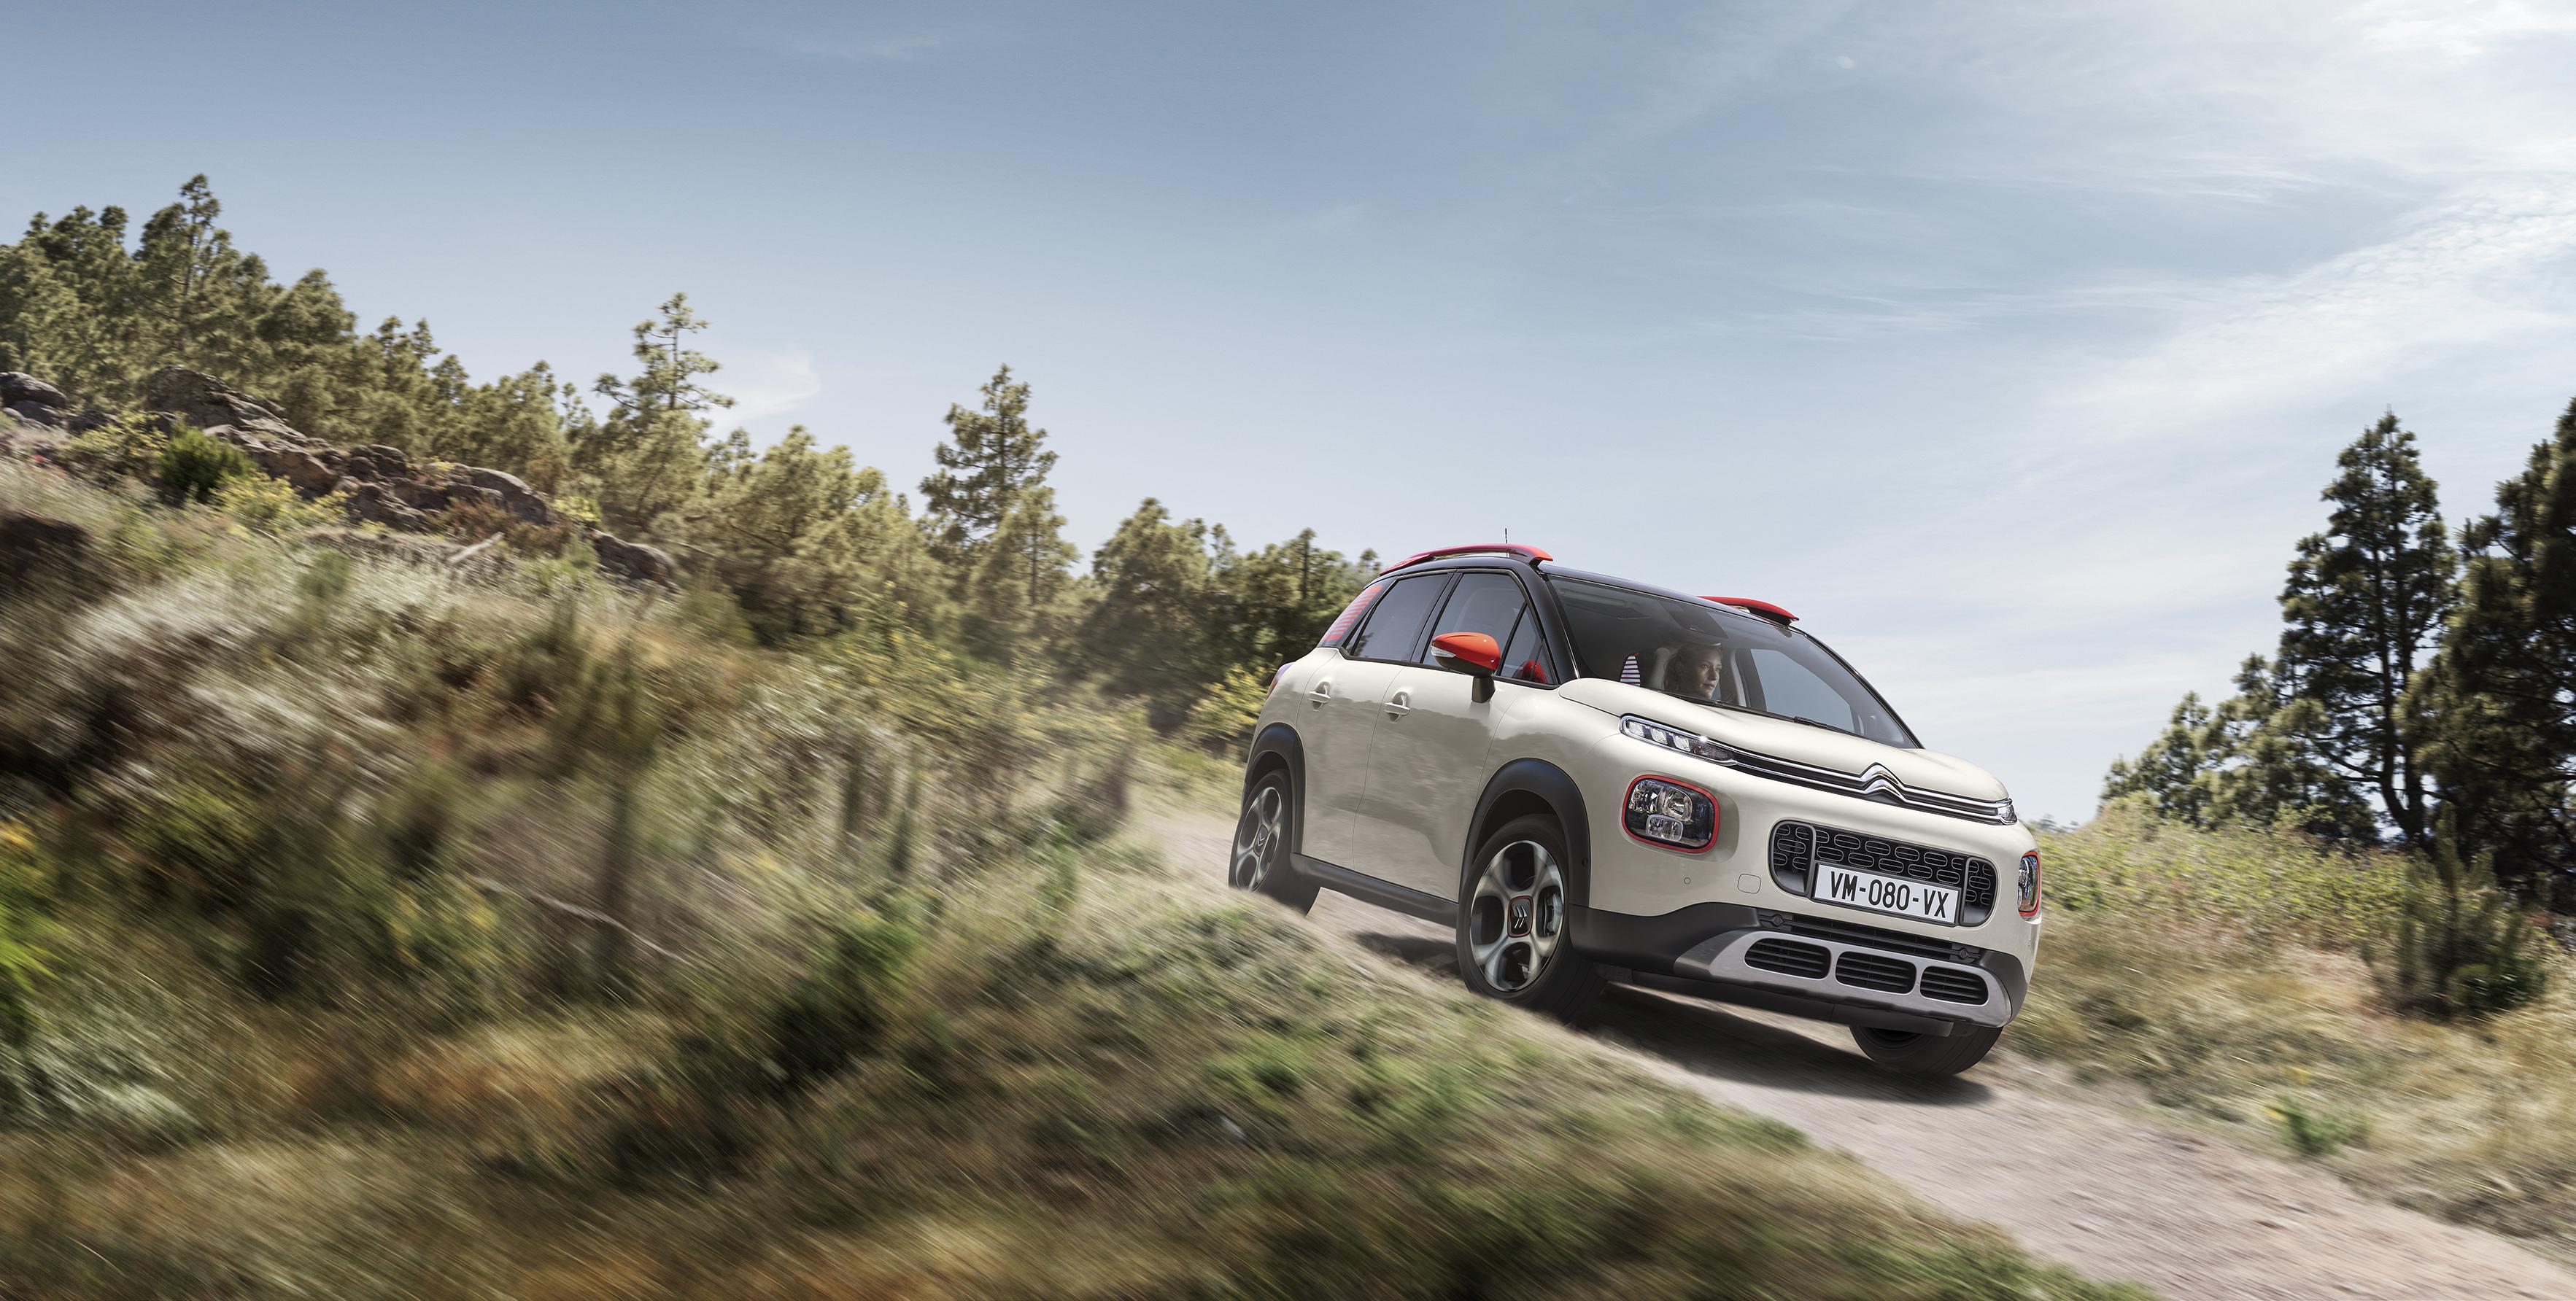 Prix Citroën C3 Aircross : 15 950 € minimum